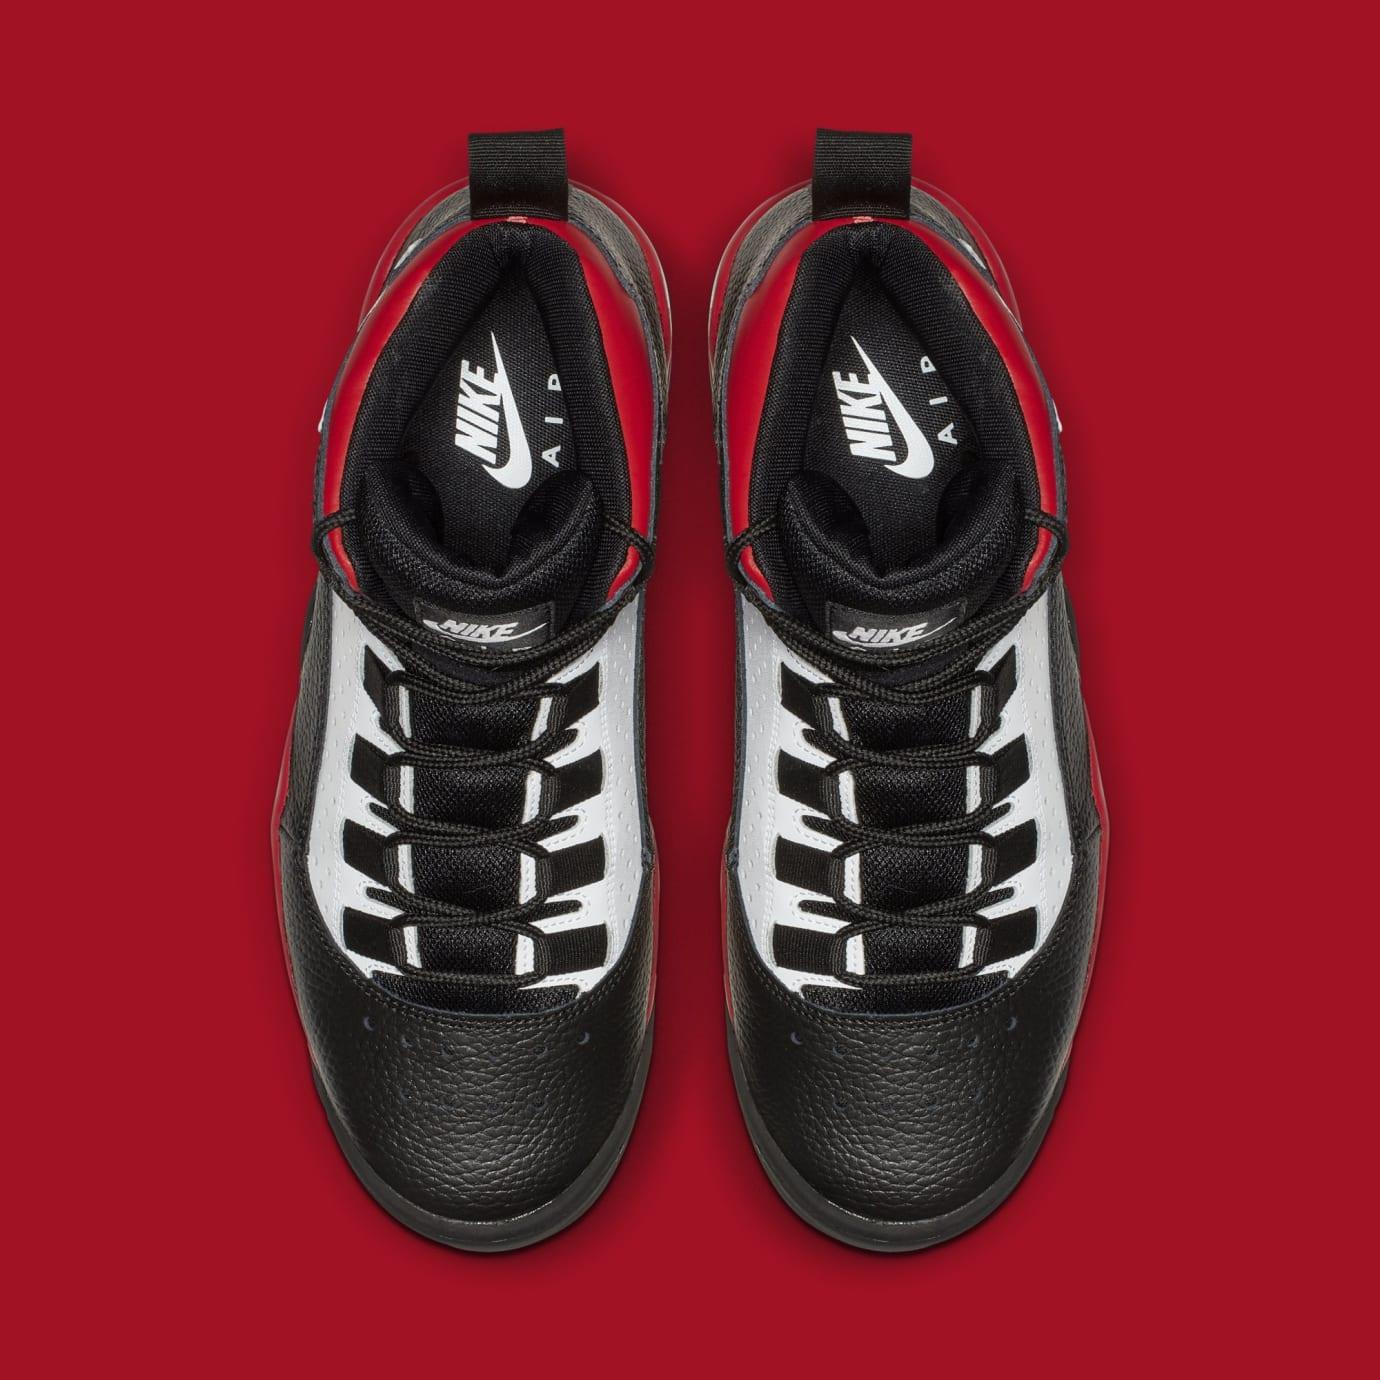 758957aa6b53 Image via Nike Nike Air Darwin  Black White University Red  AJ9710-001 (Top